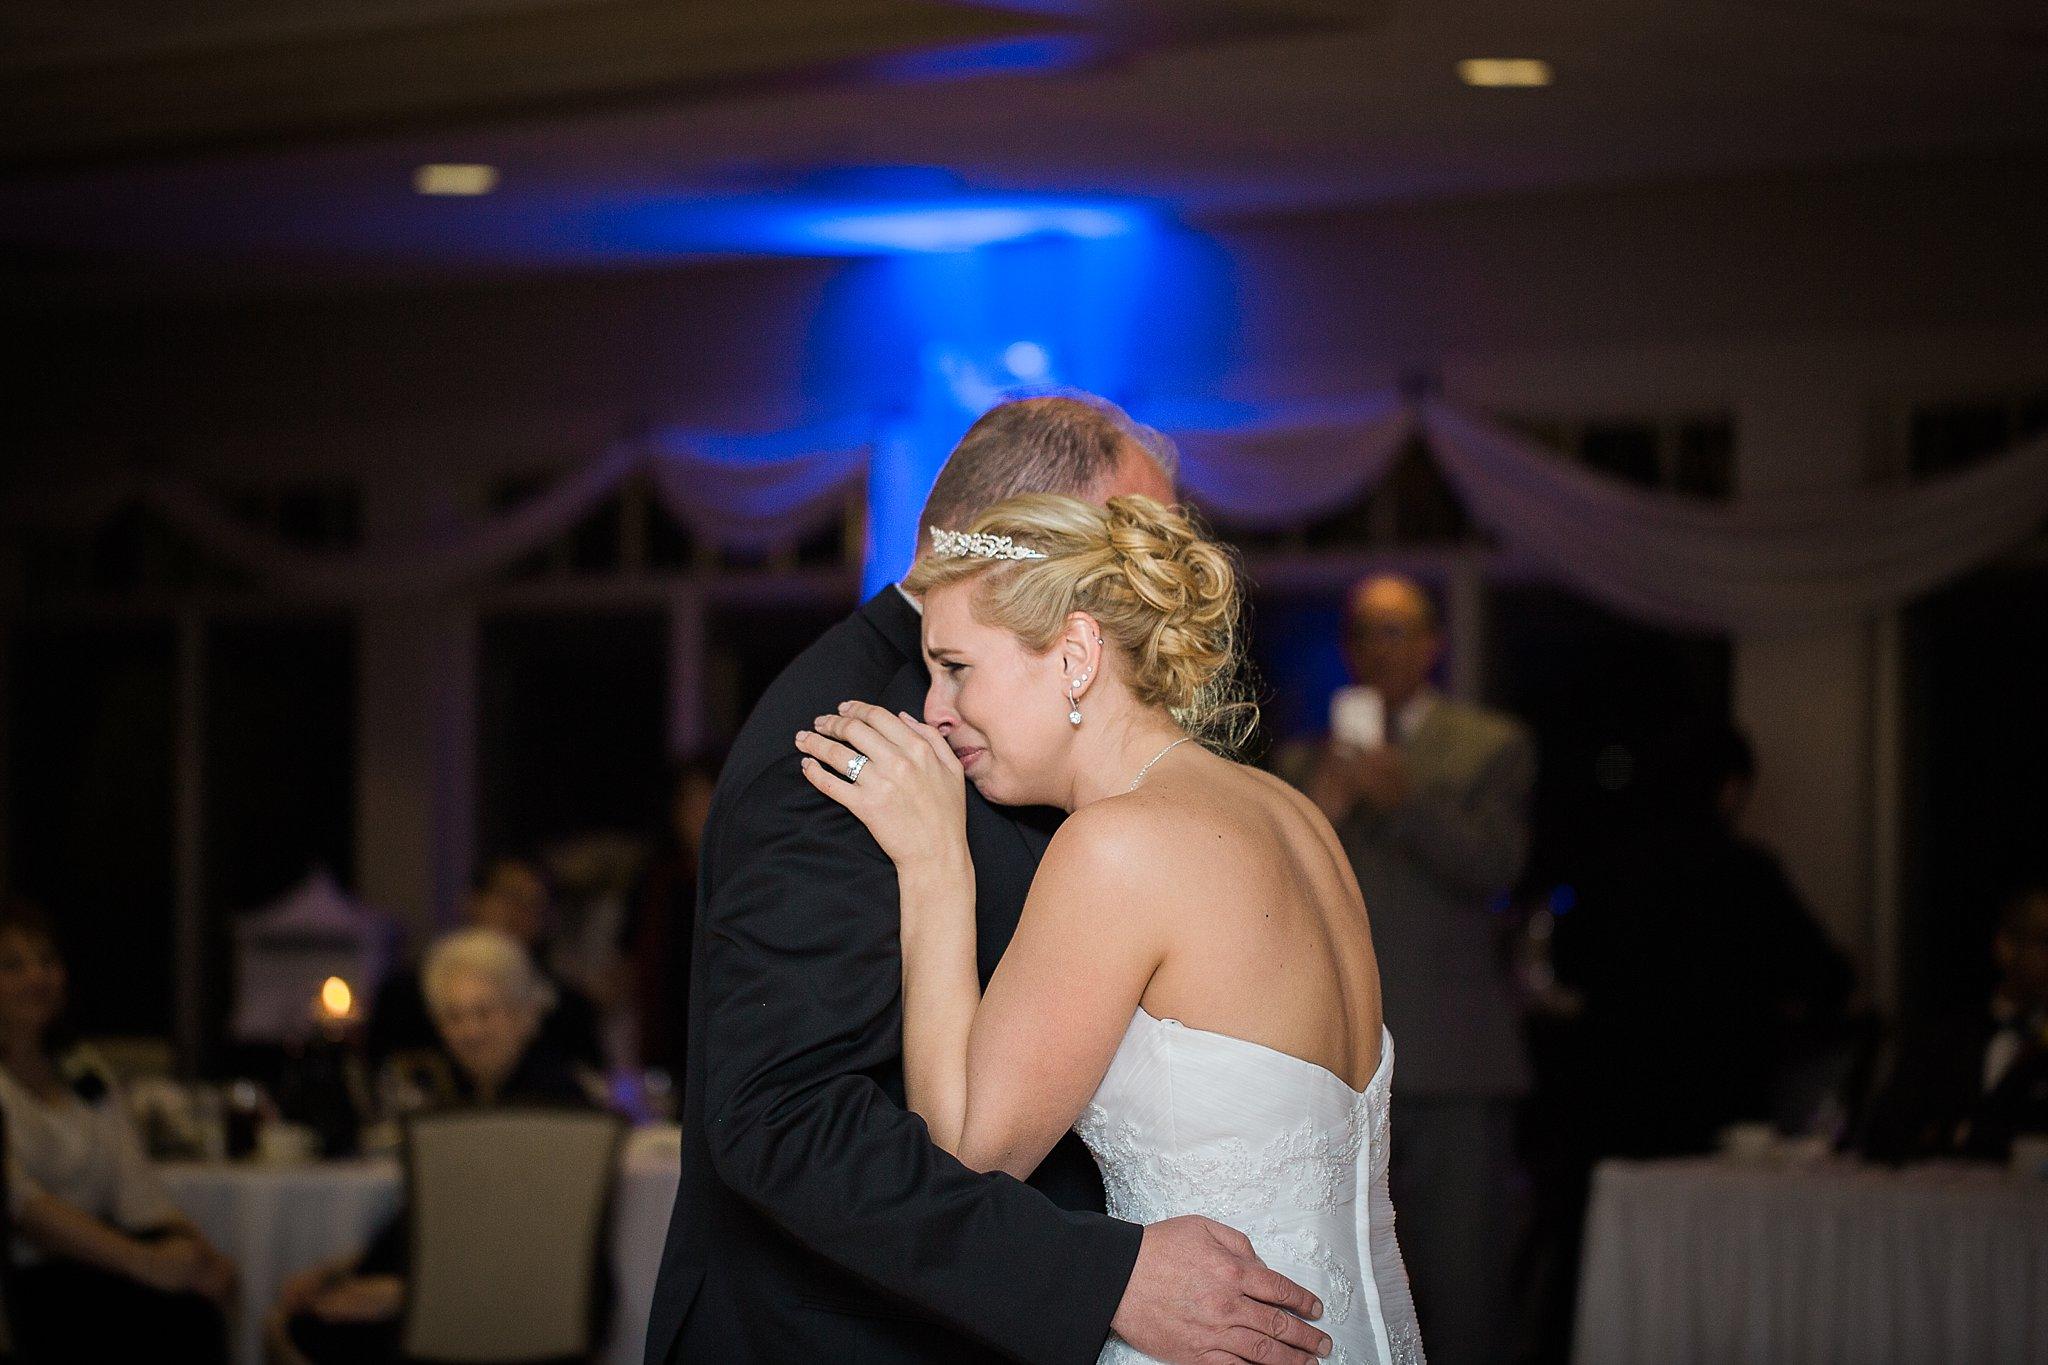 Wollaston Church of the Nazarene Wedding Boston Wedding Photographer51.jpg